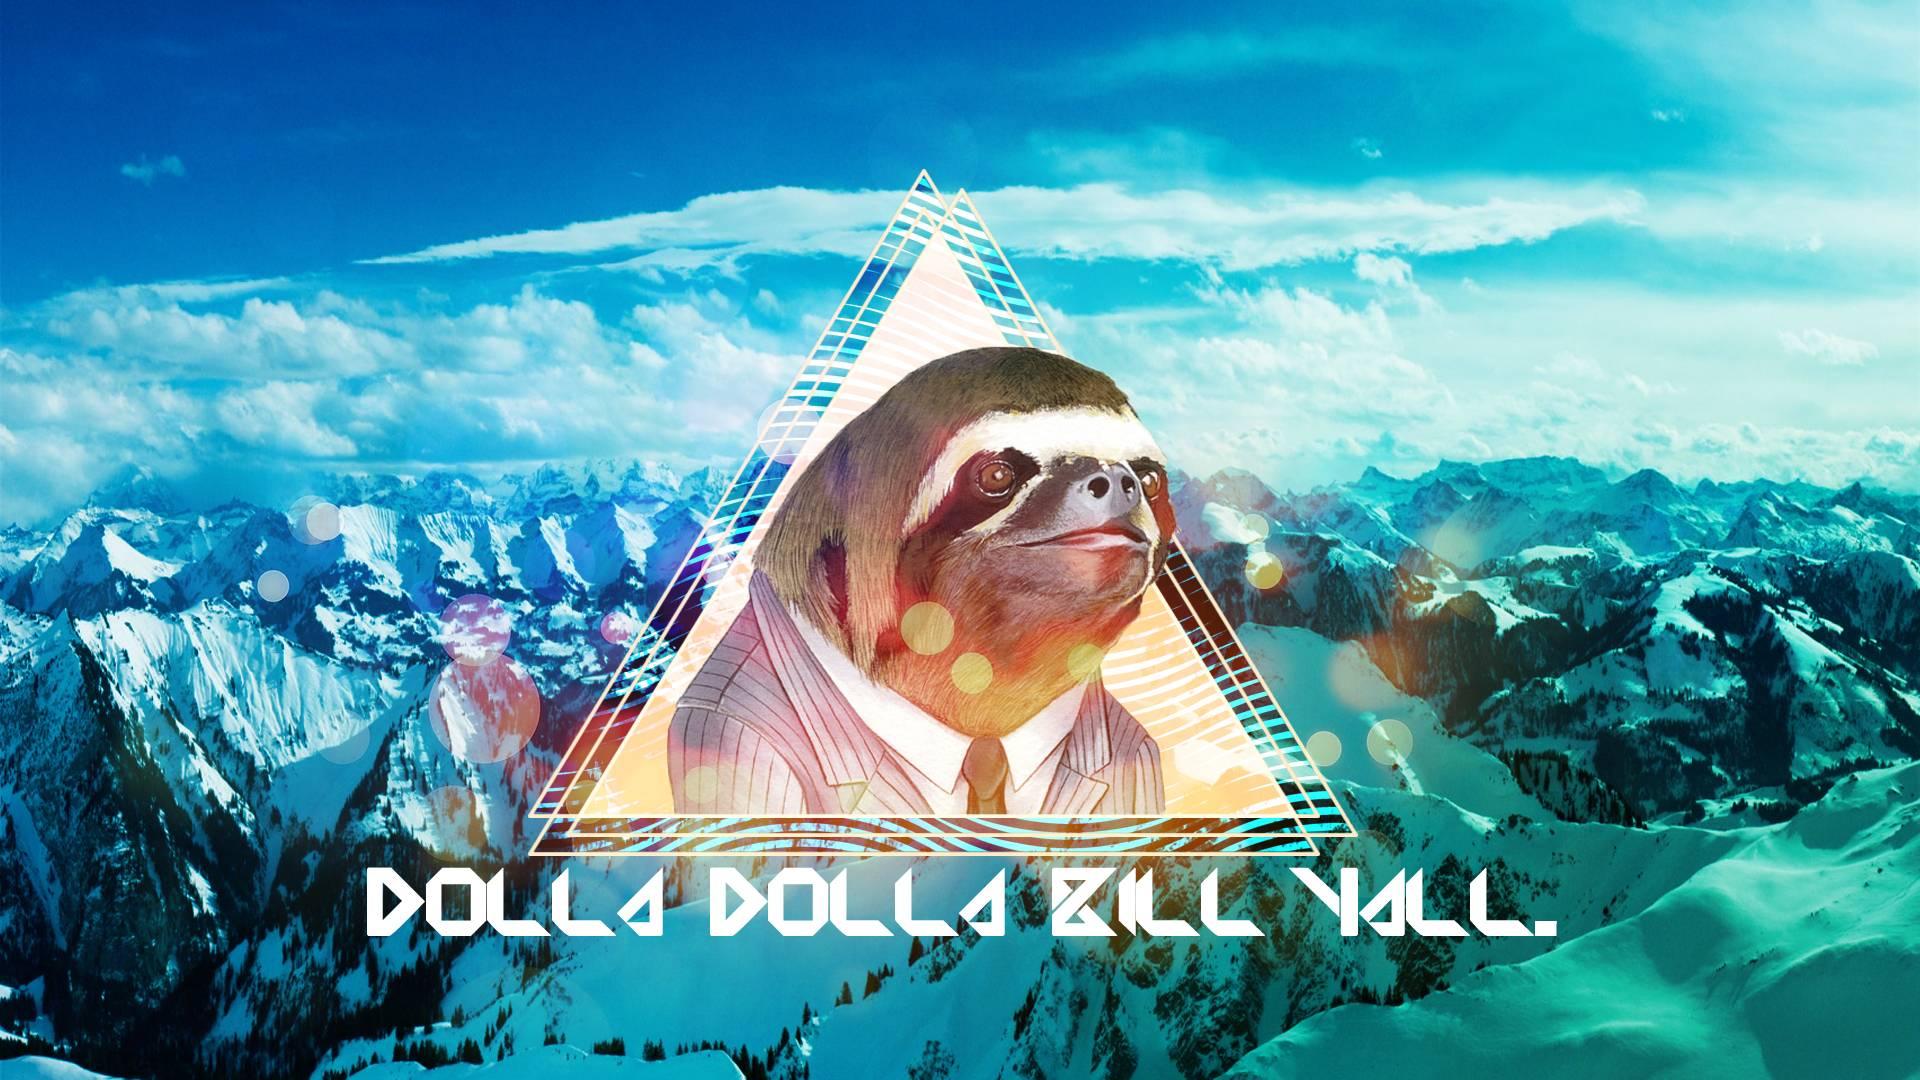 Fall Wallpaper Cartoon Sloth Backgrounds Hd Pixelstalk Net